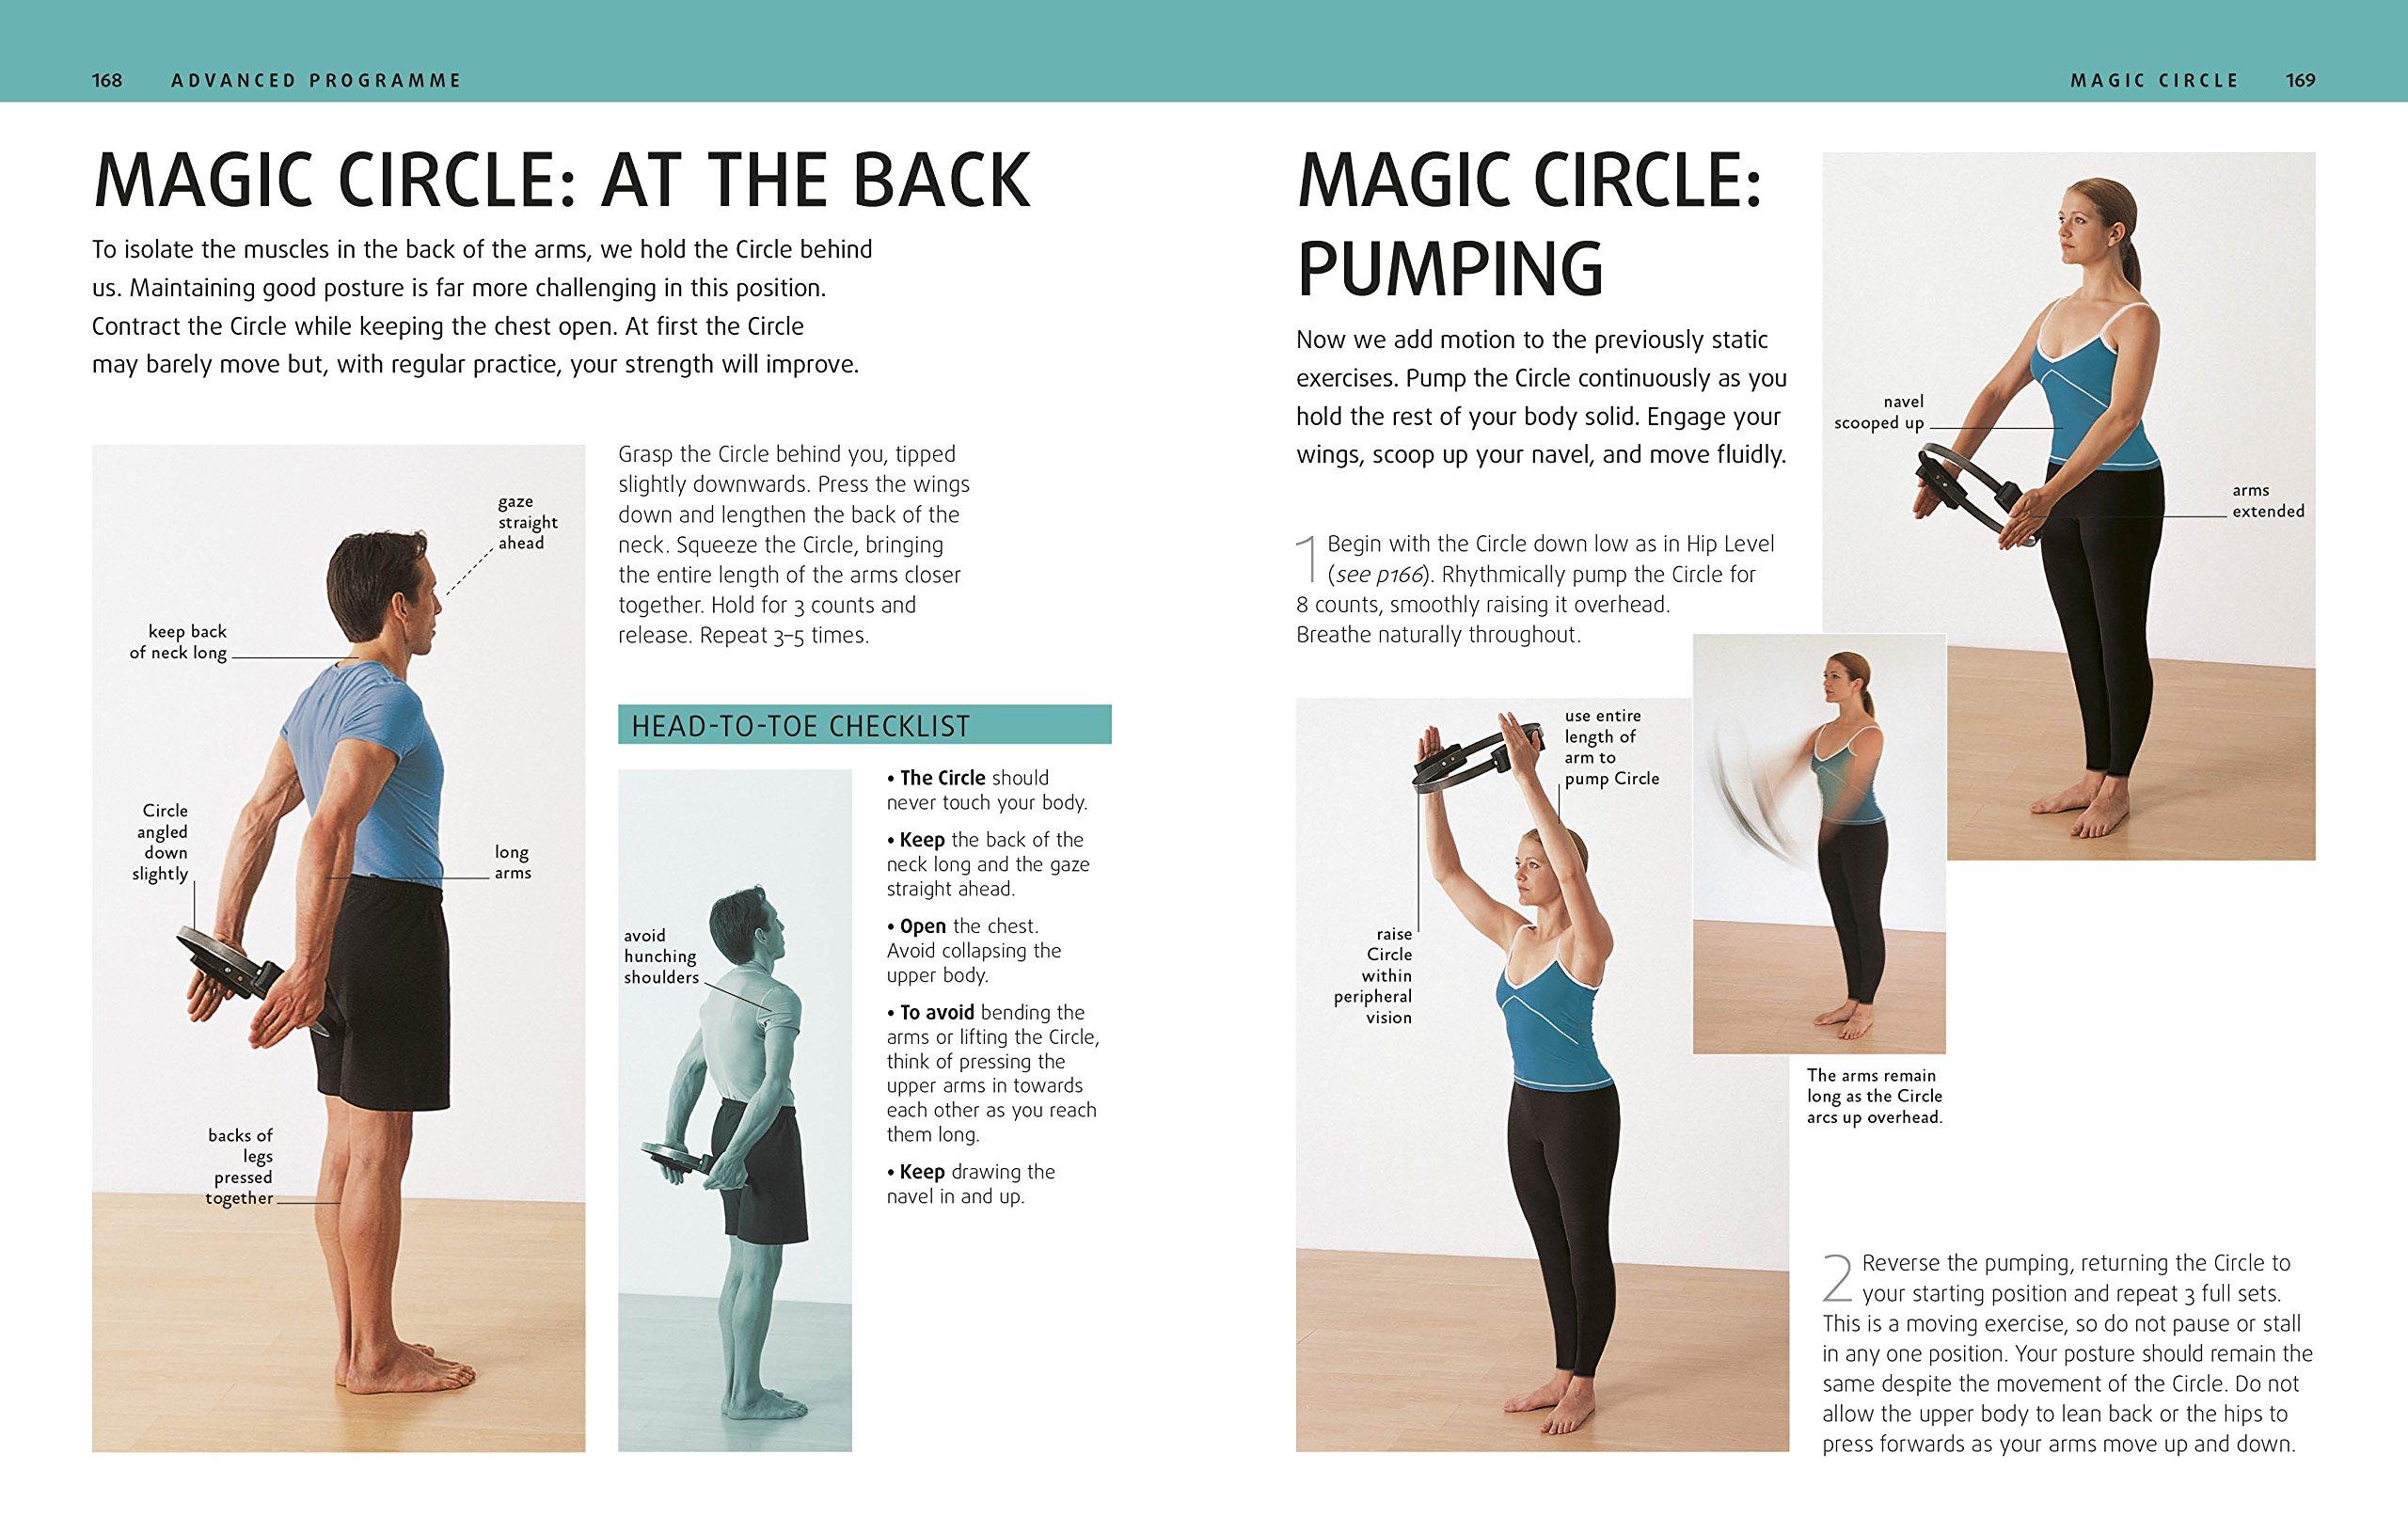 Body the pdf pilates